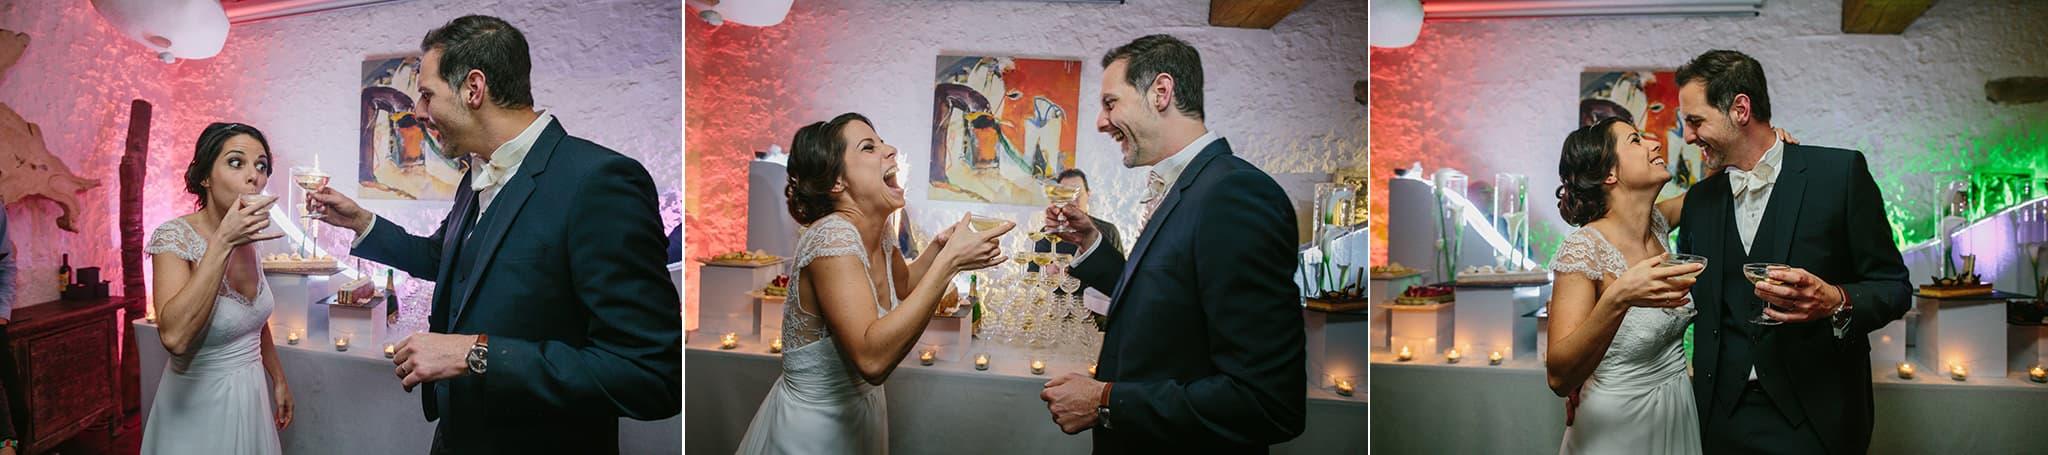 Sebastien Bicard • Paris Wedding Photography • Paris, France • Ravinet Quentin and Caroline-93